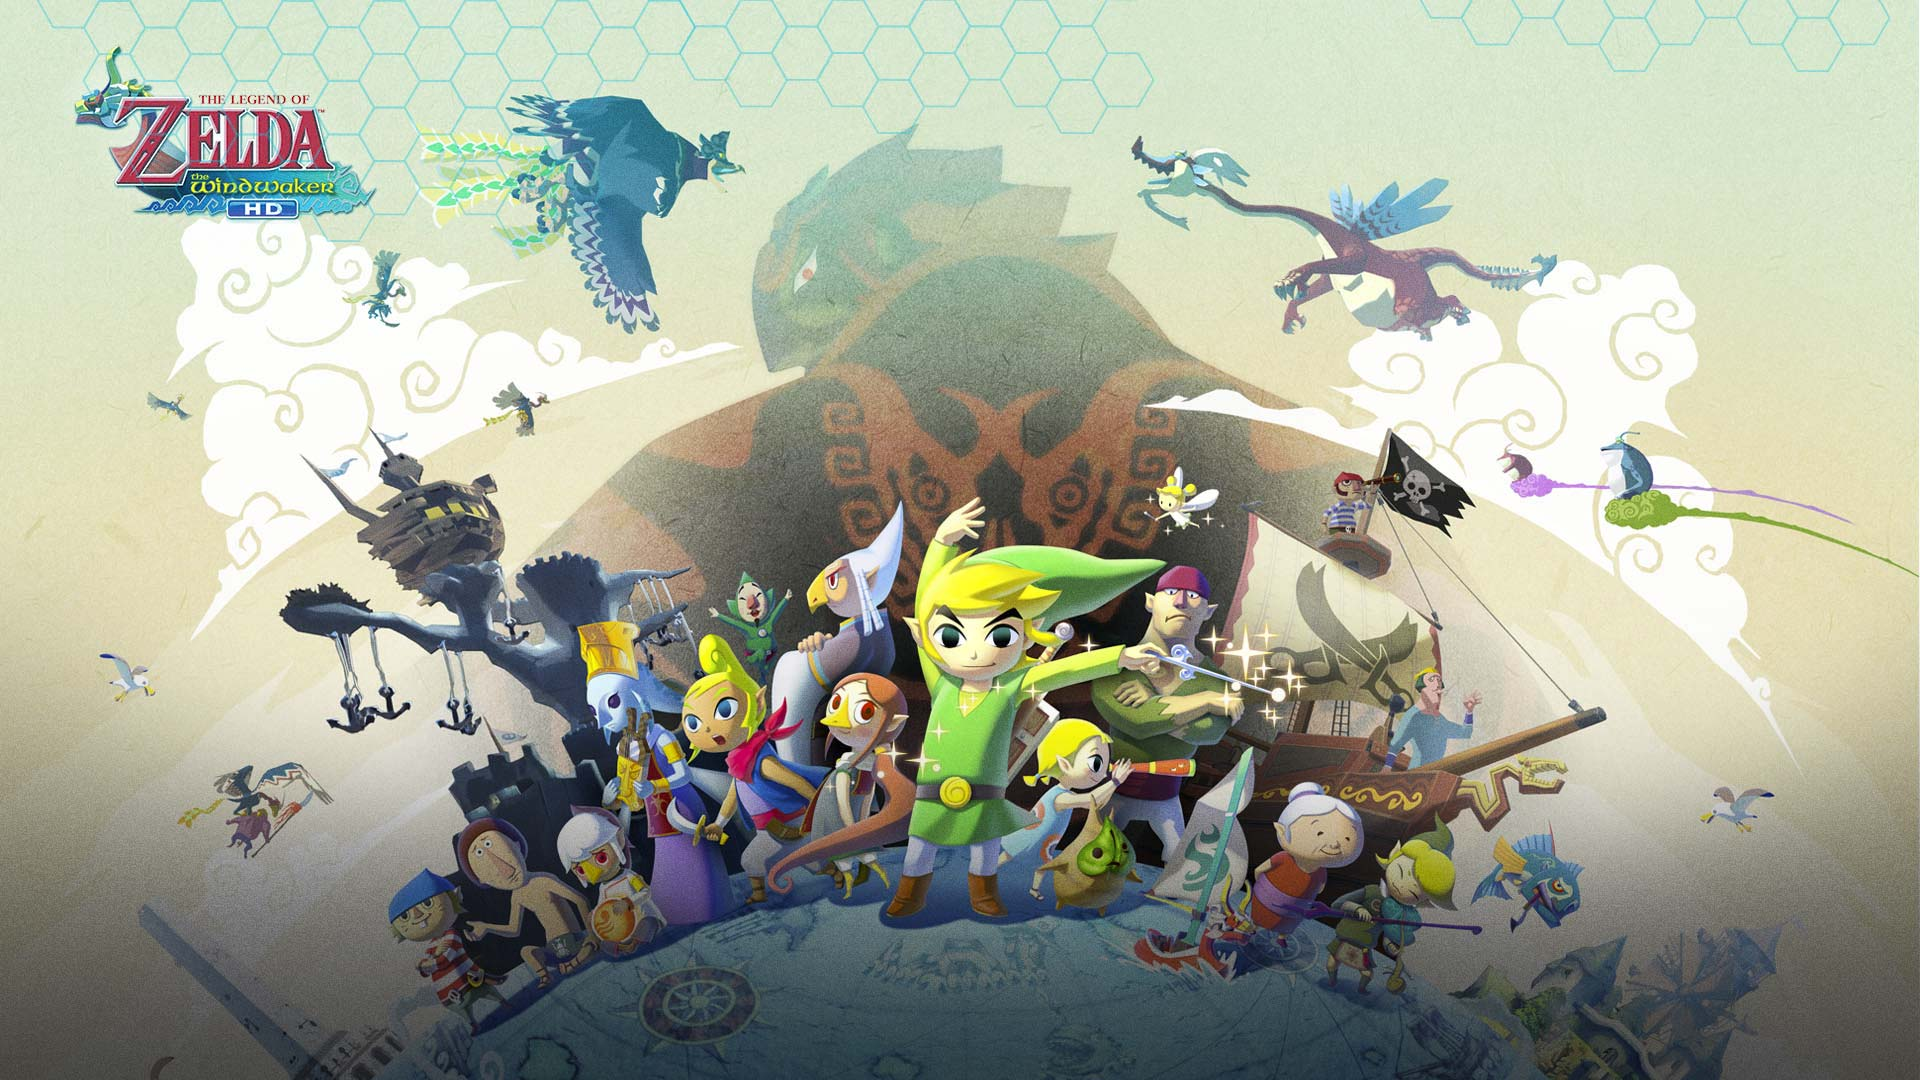 Artistry in Games zelda-windwaker1 Musical Moments: The Legend of Zelda: The Wind Waker Series  Zelda Nintendo musical moments music Legend of Zelda: The Wind Waker